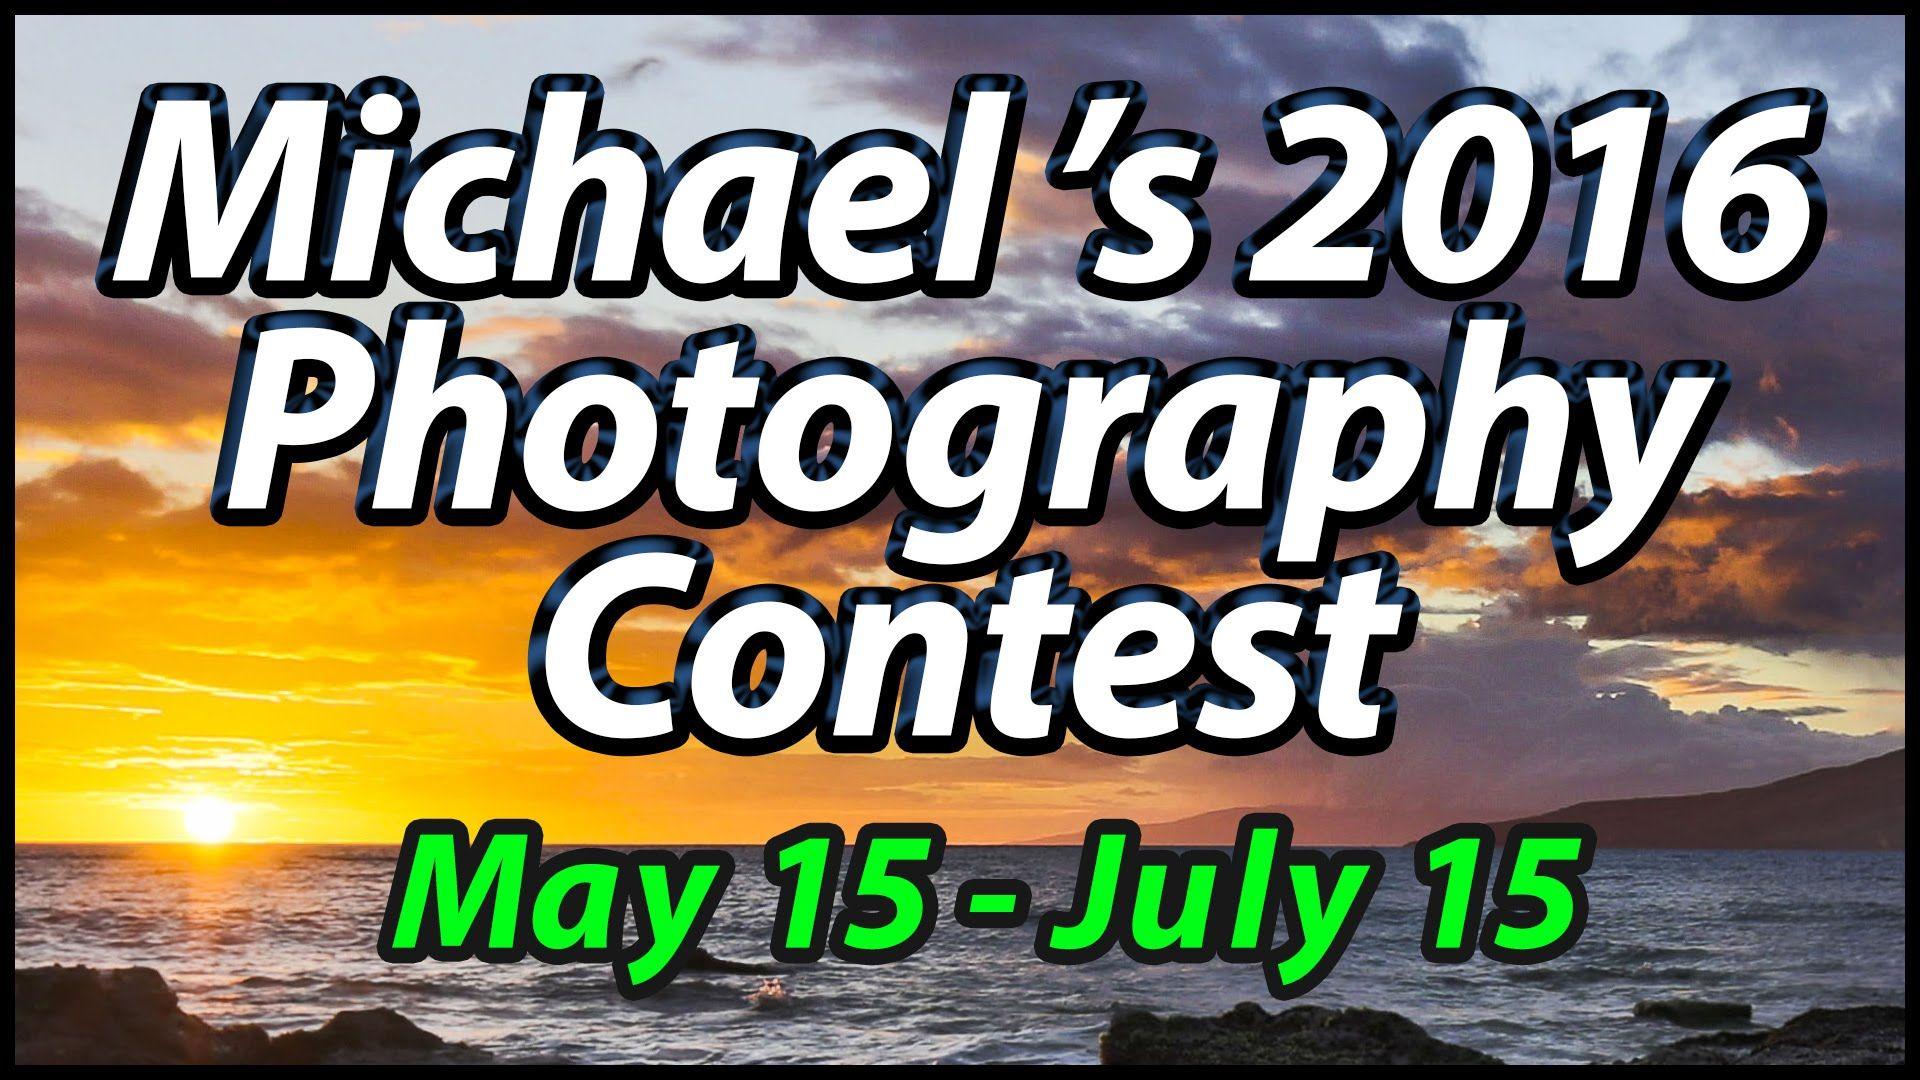 Michael's 2016 International Photography Contest